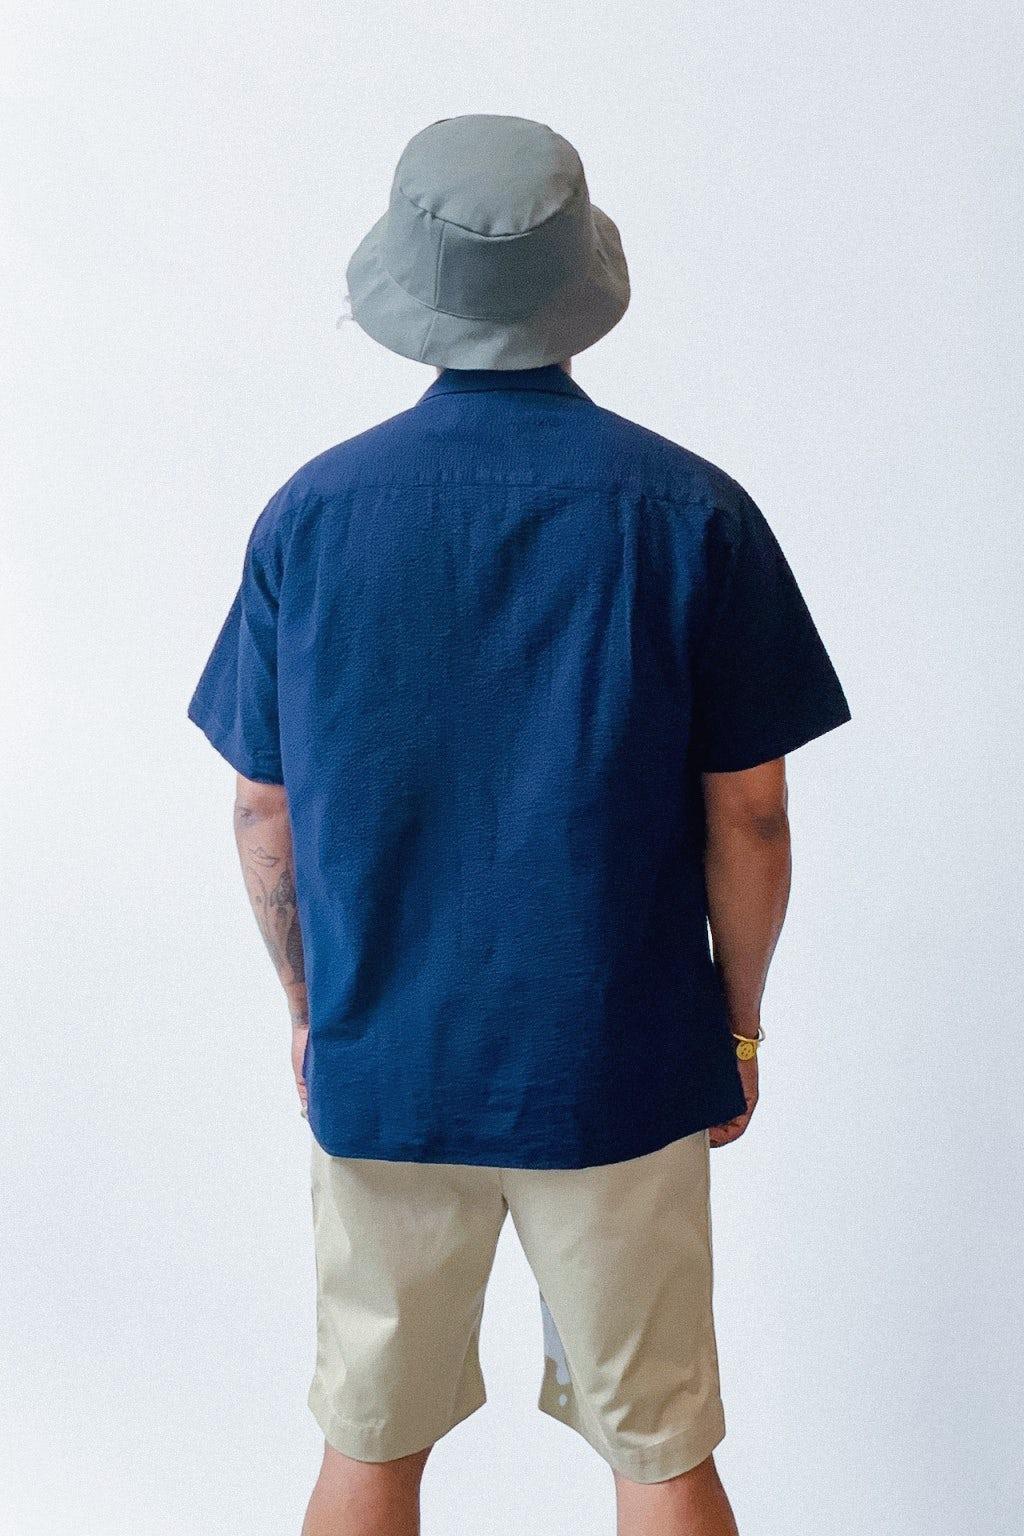 Gitman Bros. Vintage Camp Collar Shirt Navy Overdye Seersucker